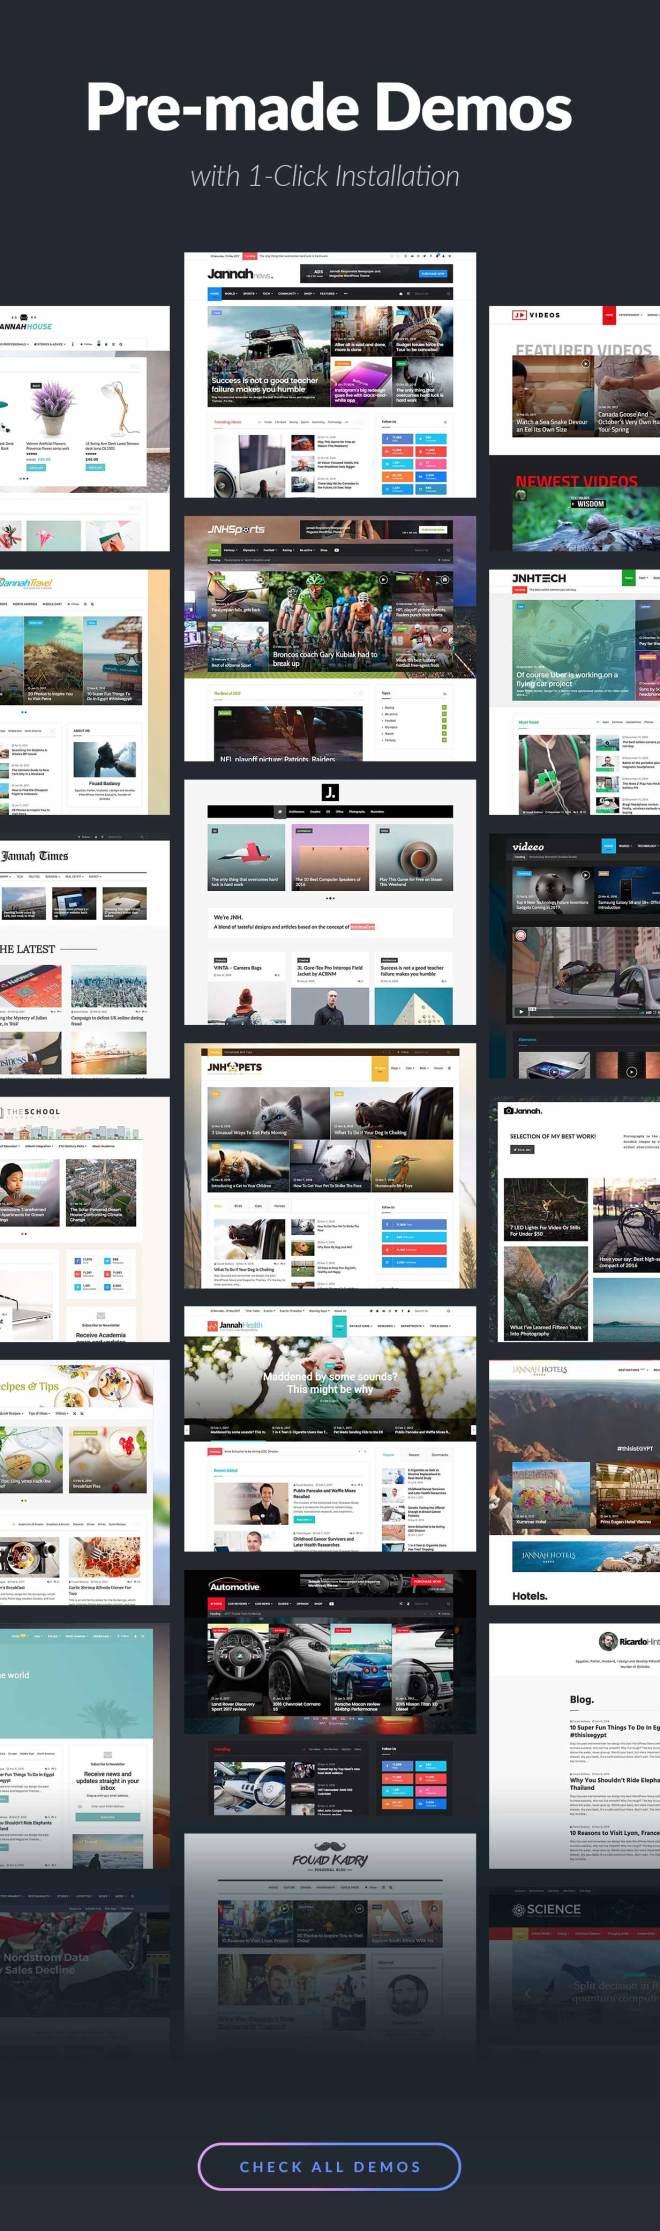 Technology Blog WordPress Theme Collection